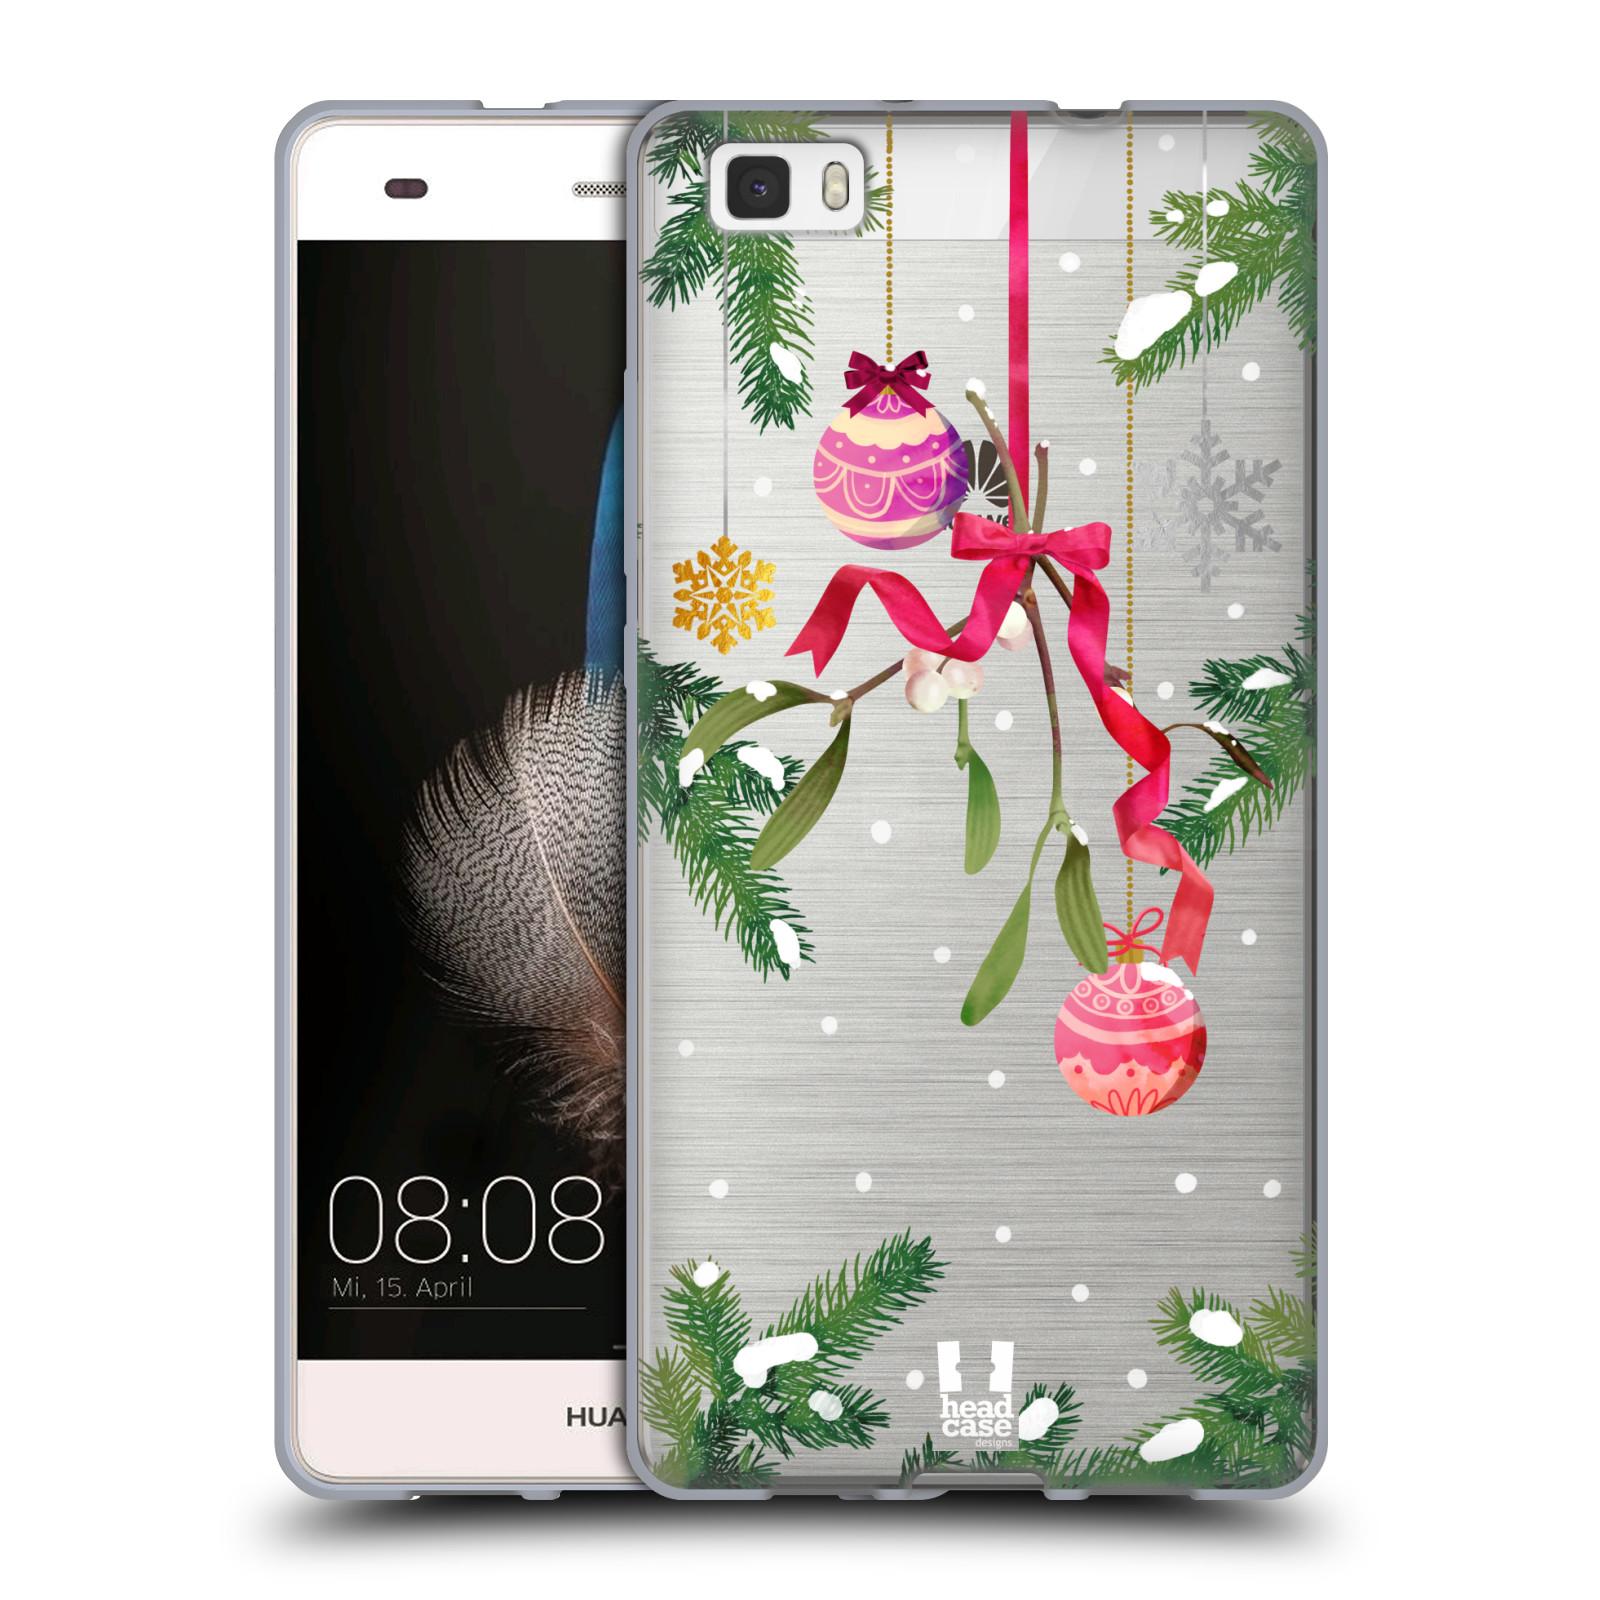 Silikonové pouzdro na mobil Huawei P8 Lite - Head Case - Větvičky a vánoční ozdoby